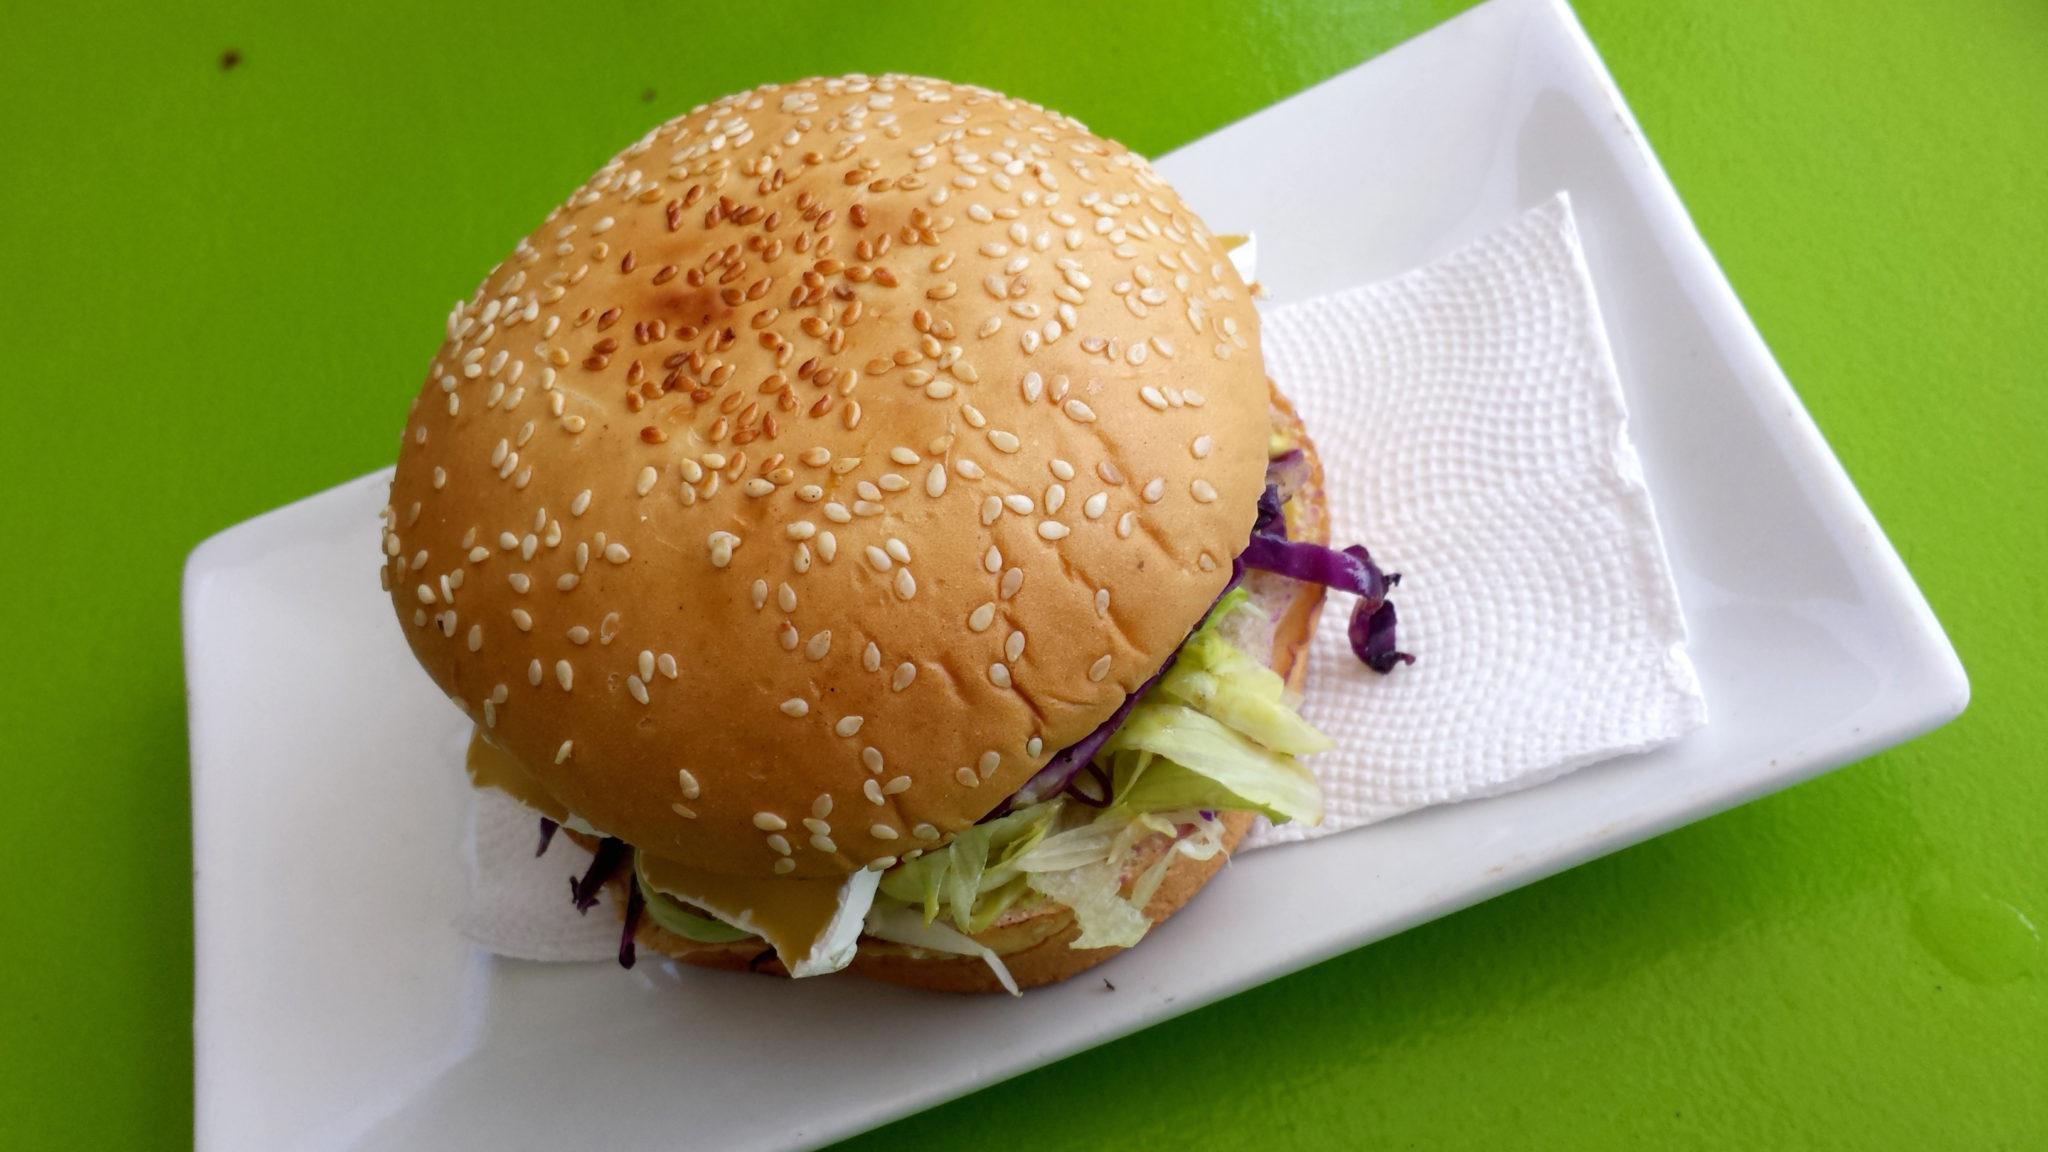 Republique_dominicaine_mes_bonnes_adresses_bayahibe_restaurant_saona_cafe_veggie_burger